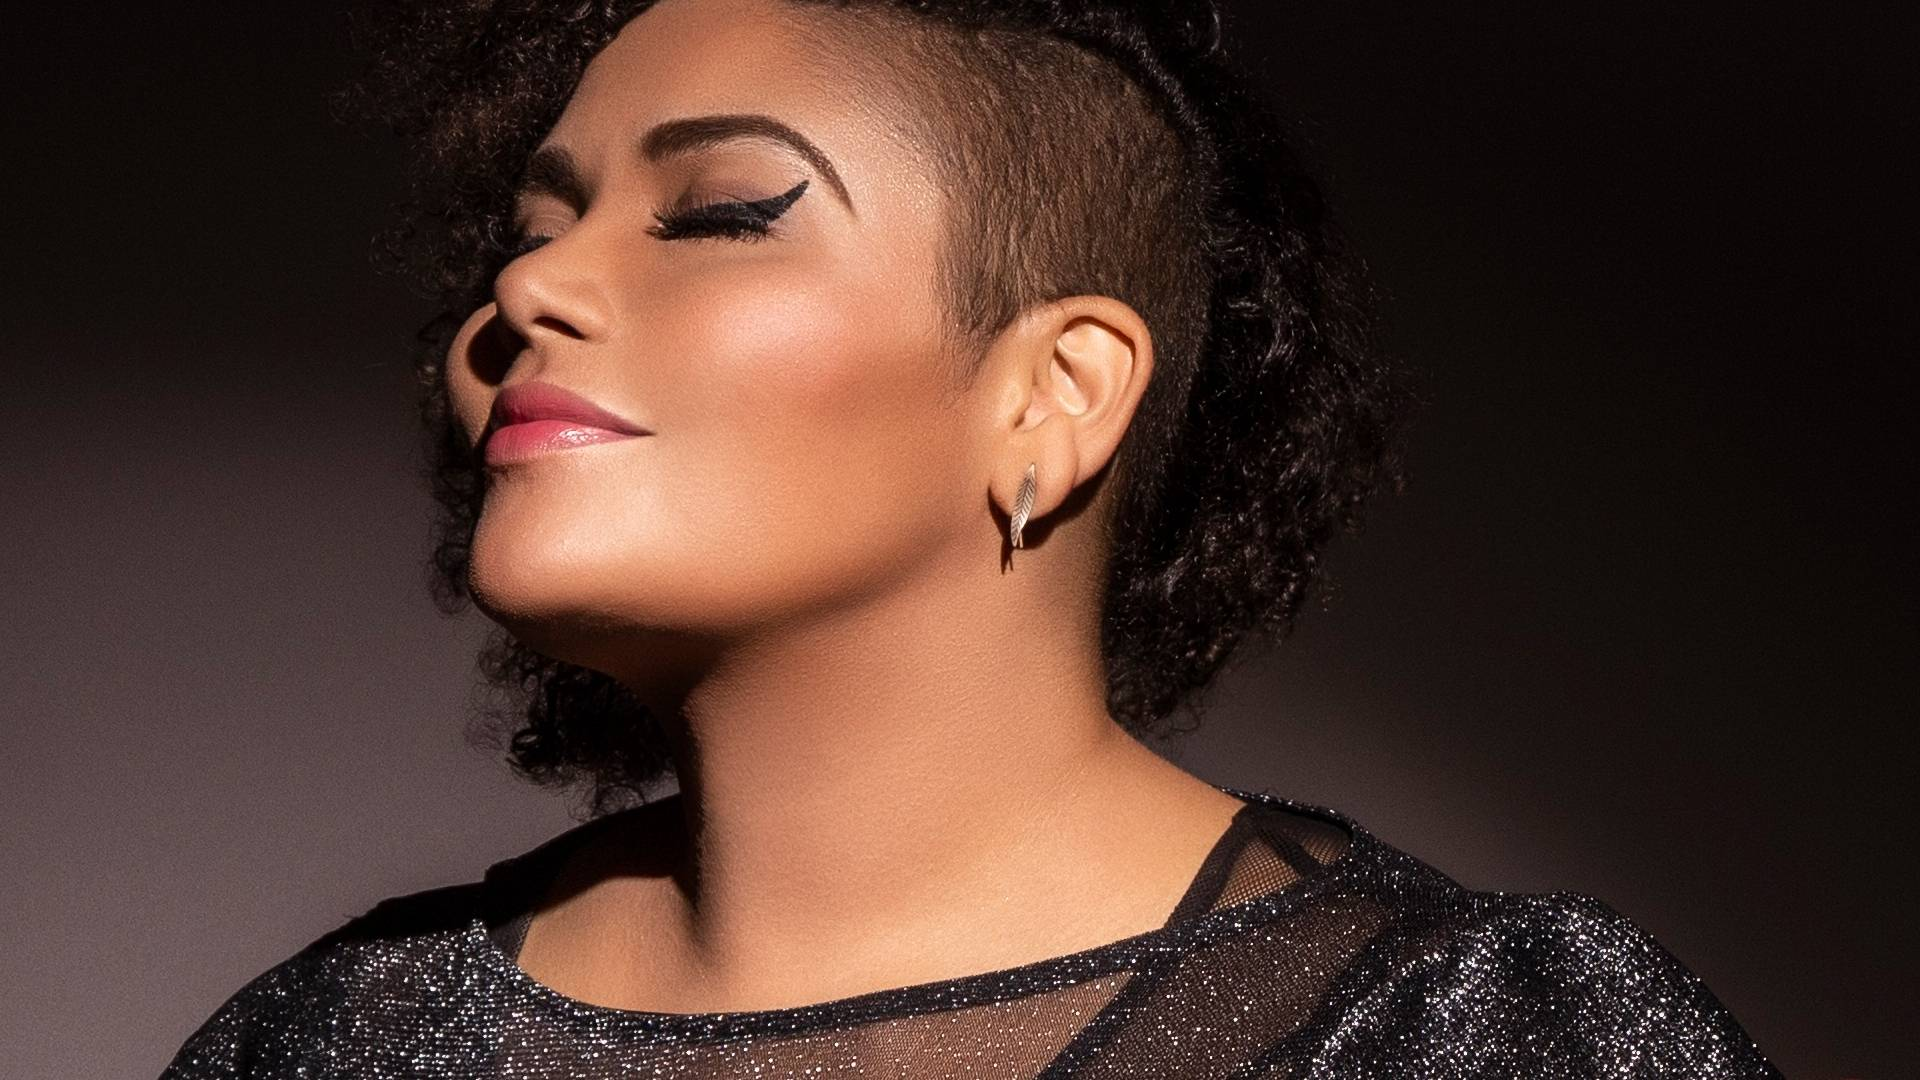 www.juicysantos.com.br - alma thomas no santos jazz festival 2019 cantando nina simone